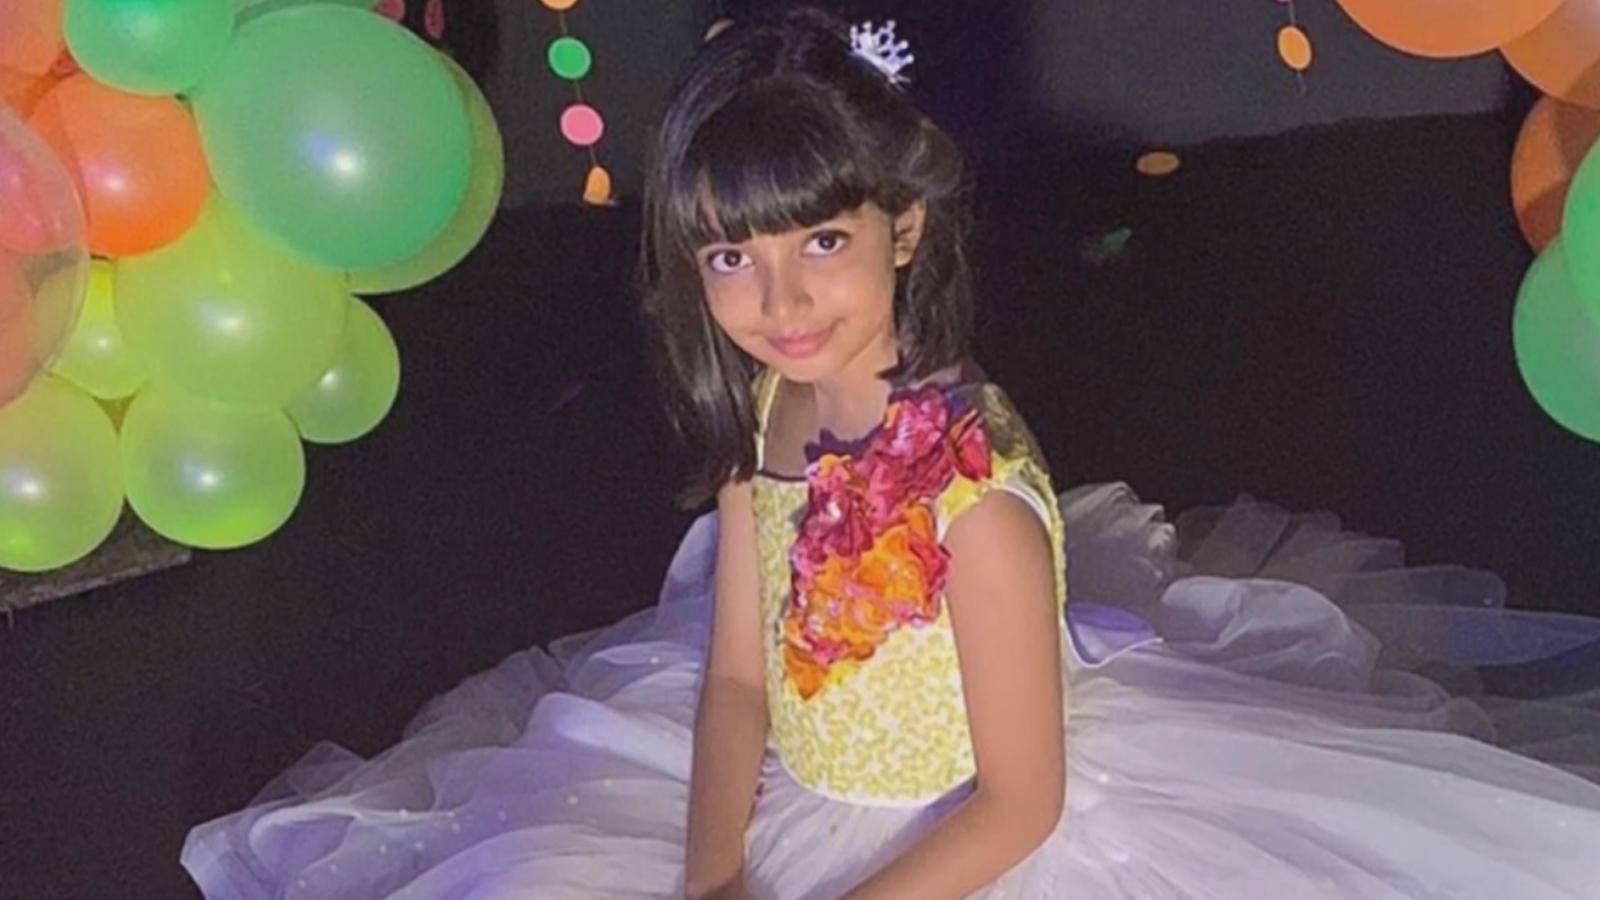 aishwarya-rai-bachchan-slammed-for-putting-makeup-on-aaradhya-bachchan-on-her-birthday